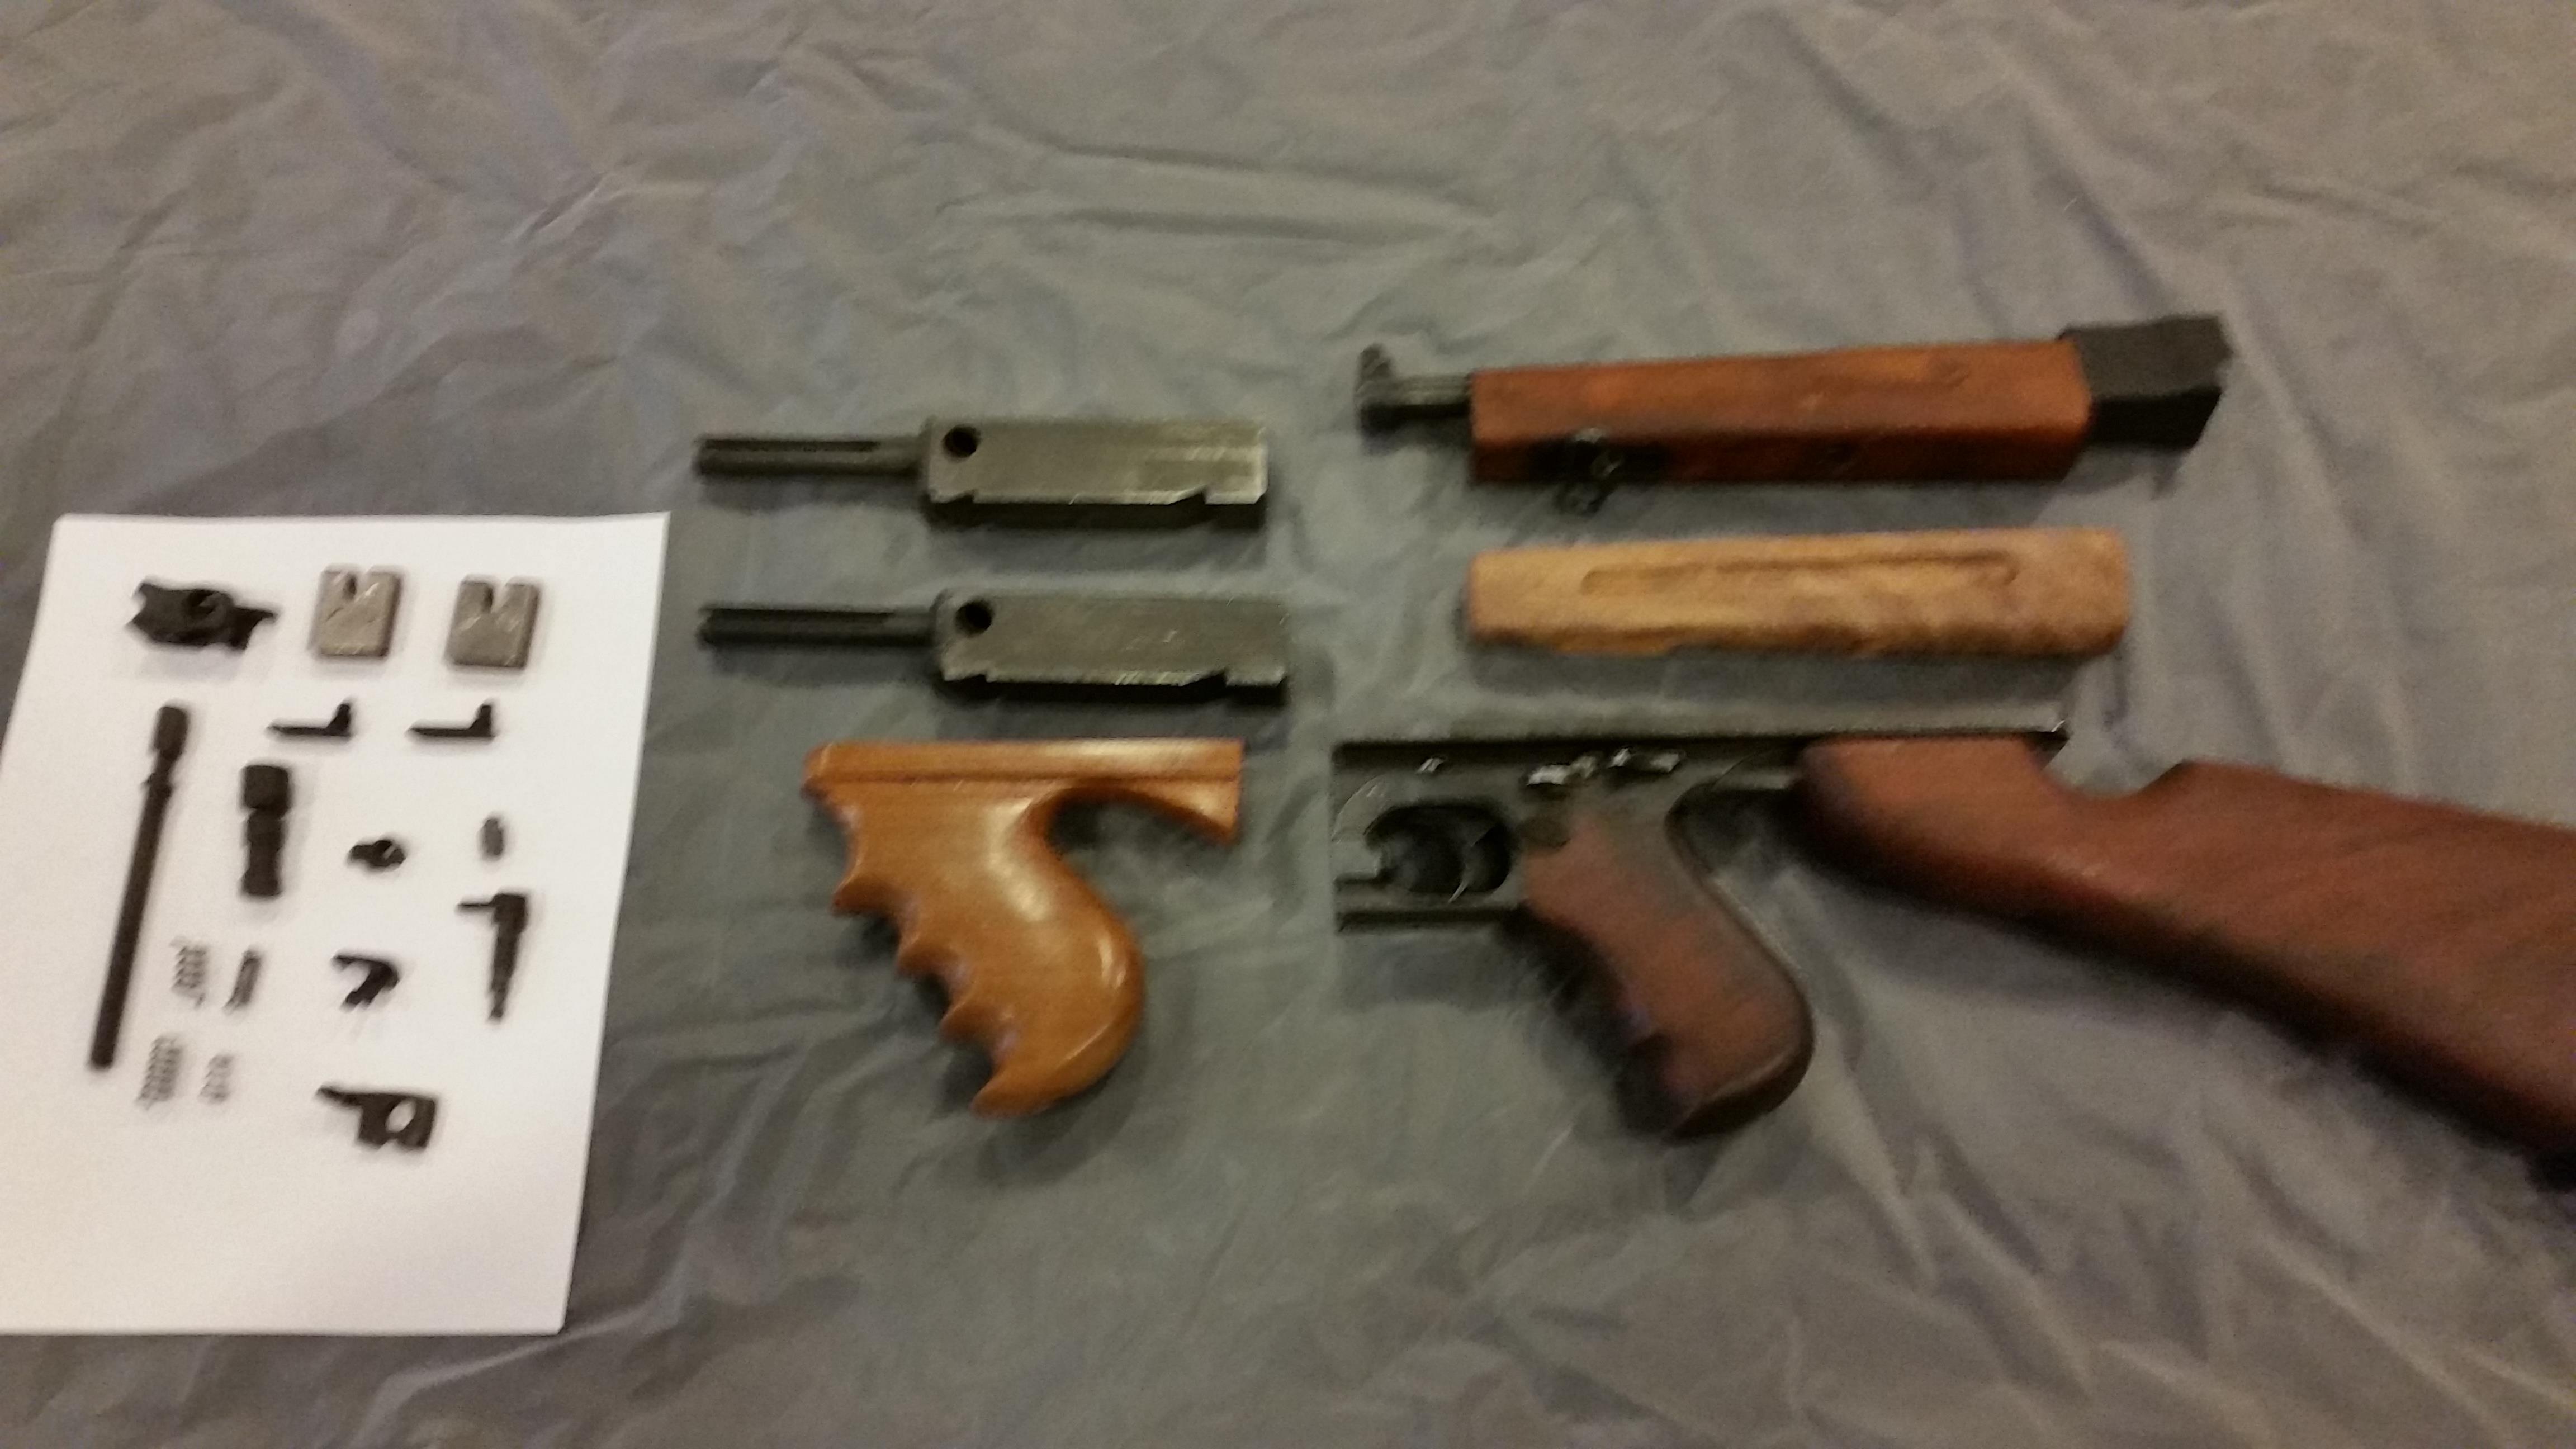 Thompson M1A1 full auto parts kit